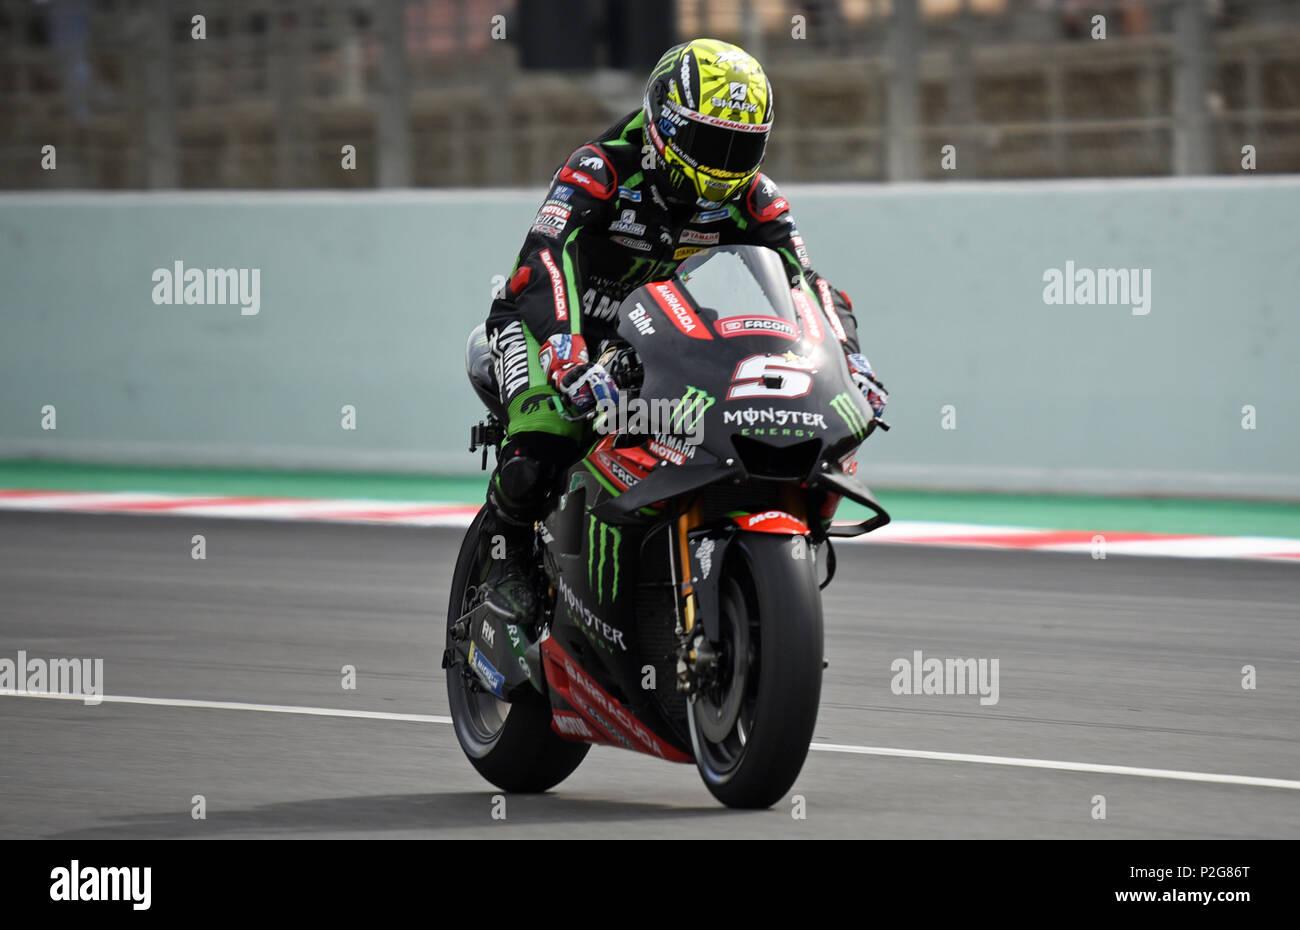 Barcelona -15th June 2018- SPAIN: Johann Zarco during the free practice of the GP Catalunya Moto GP, in the Barcelona-Catalunya Circuit, on 15th June 2018. Photo: Joan Valls/Urbanandsport/Cordon Press - Stock Image